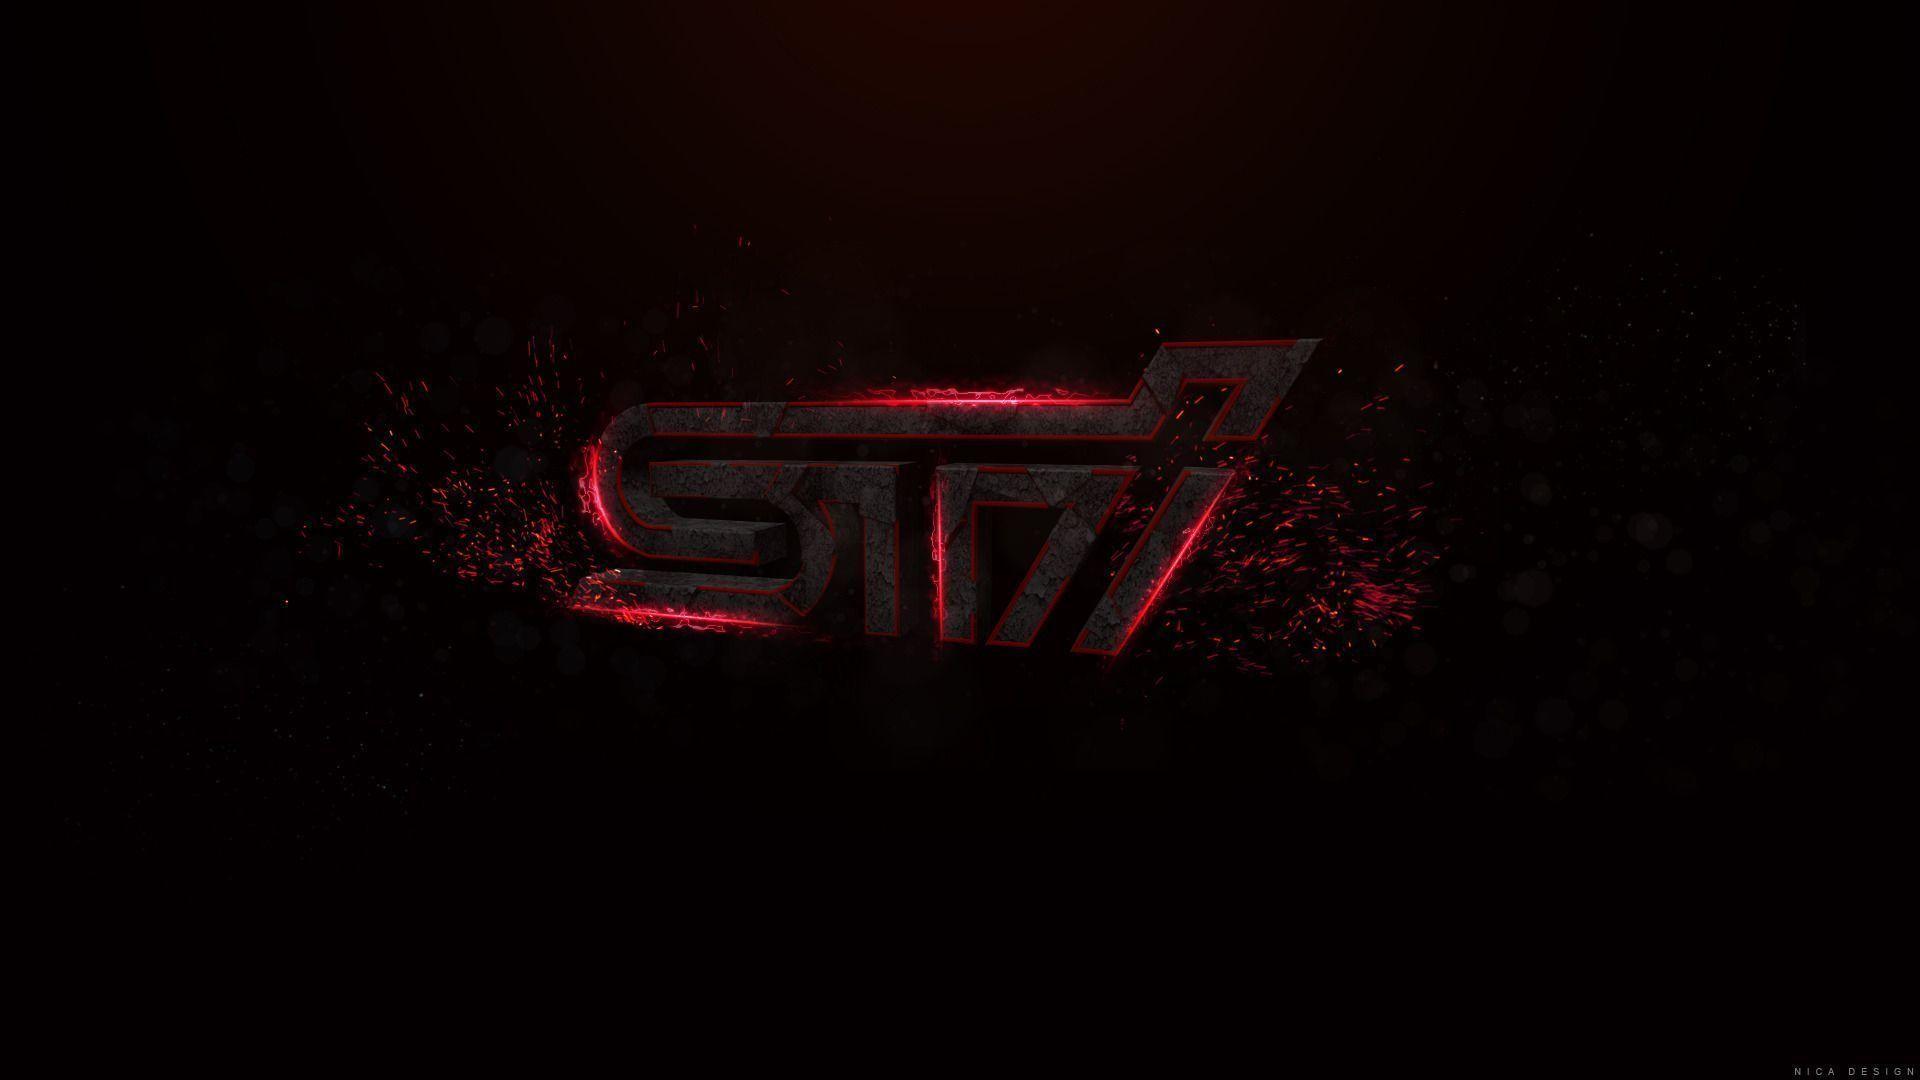 sti logo wallpaper 56 images